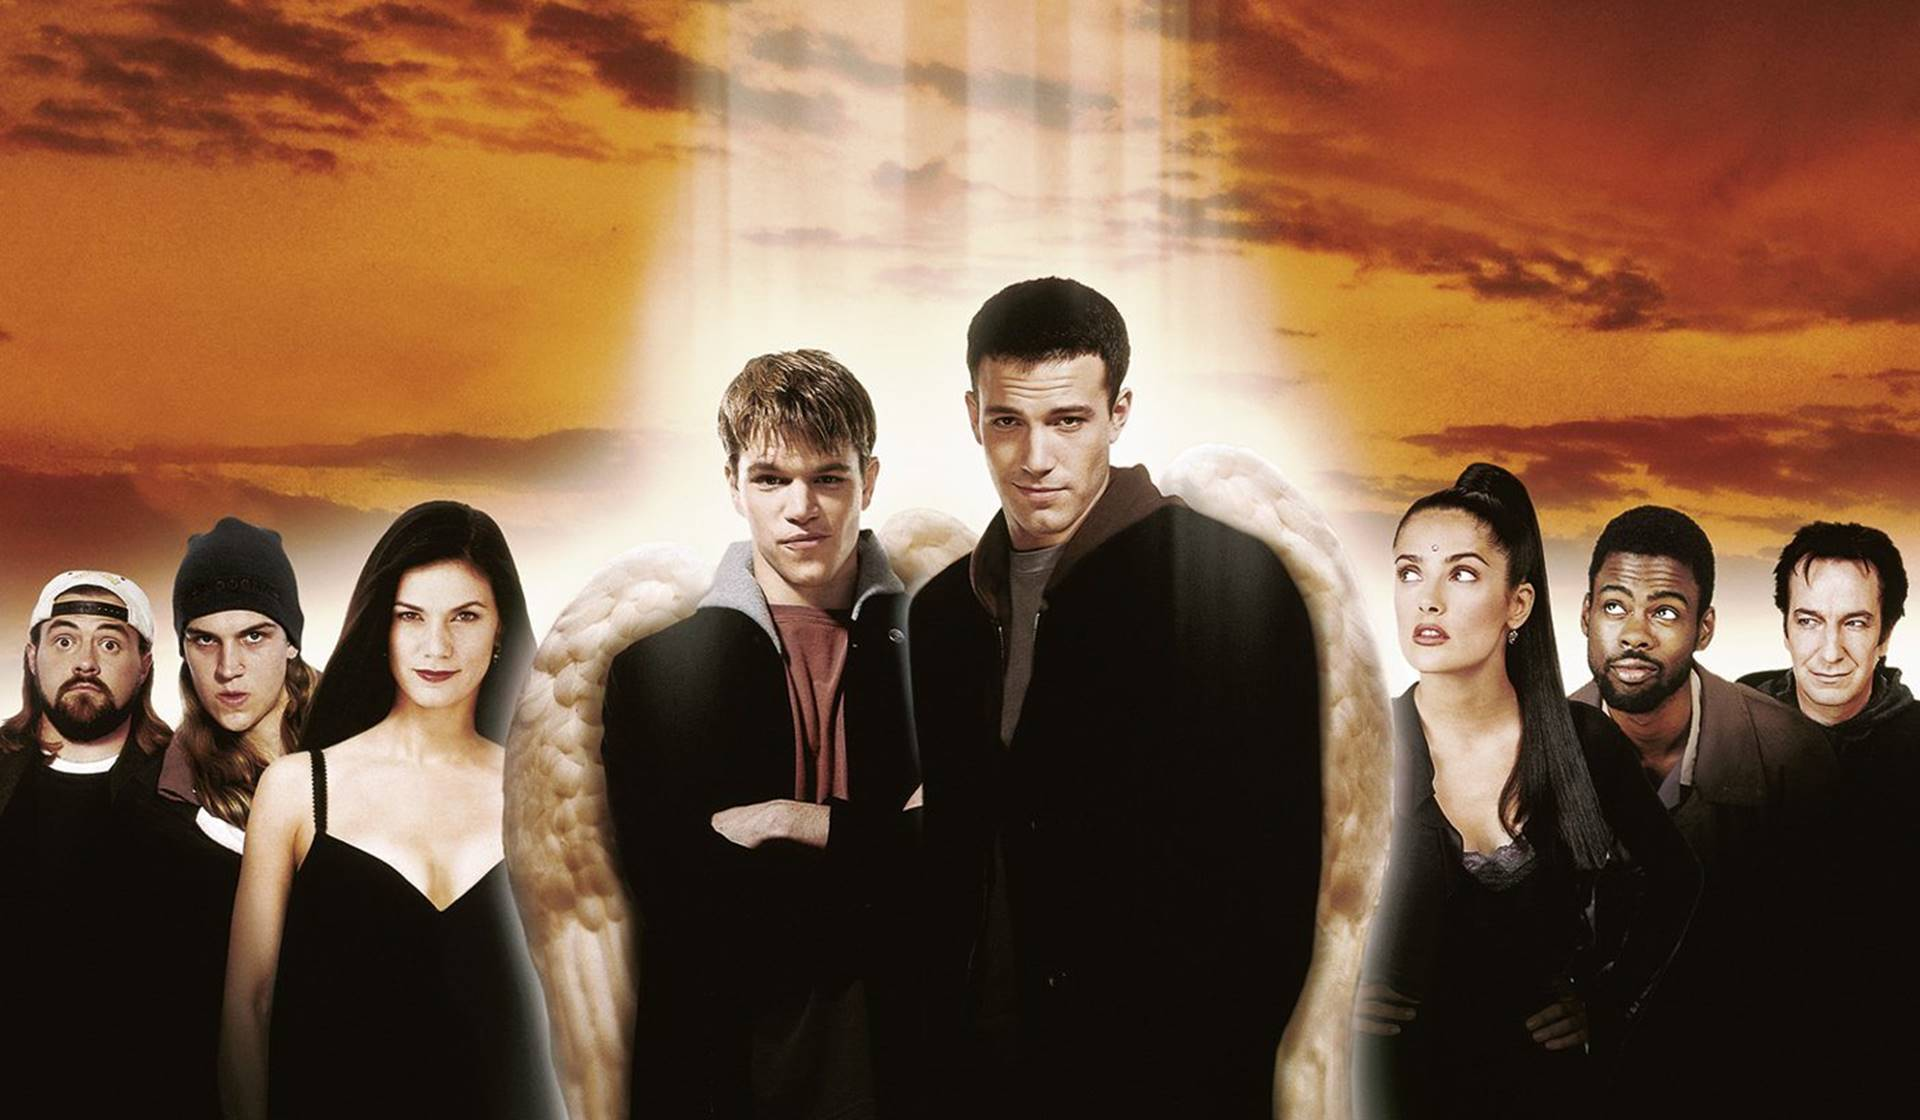 Dogma (1999) con Ben Affleck y Matt Damon.